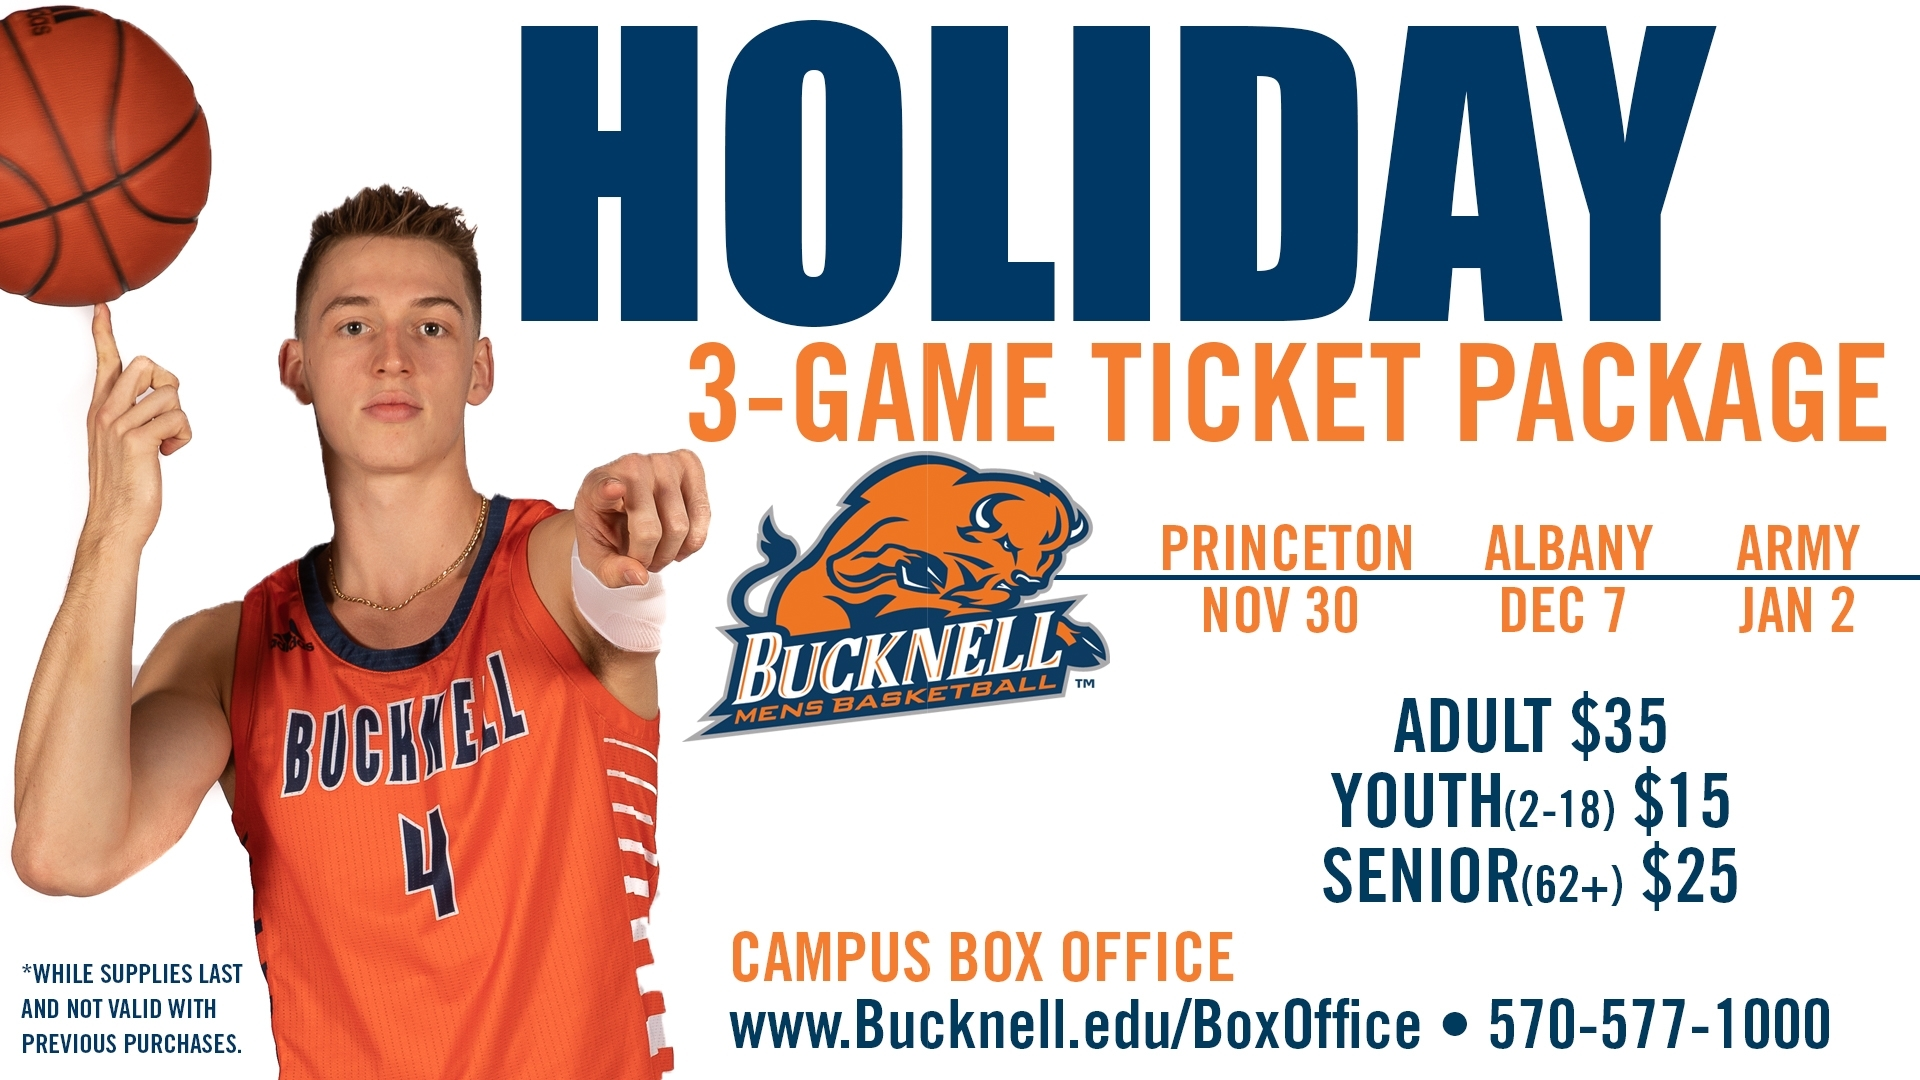 Bucknell University - Ticket Sales - Men's Basketball